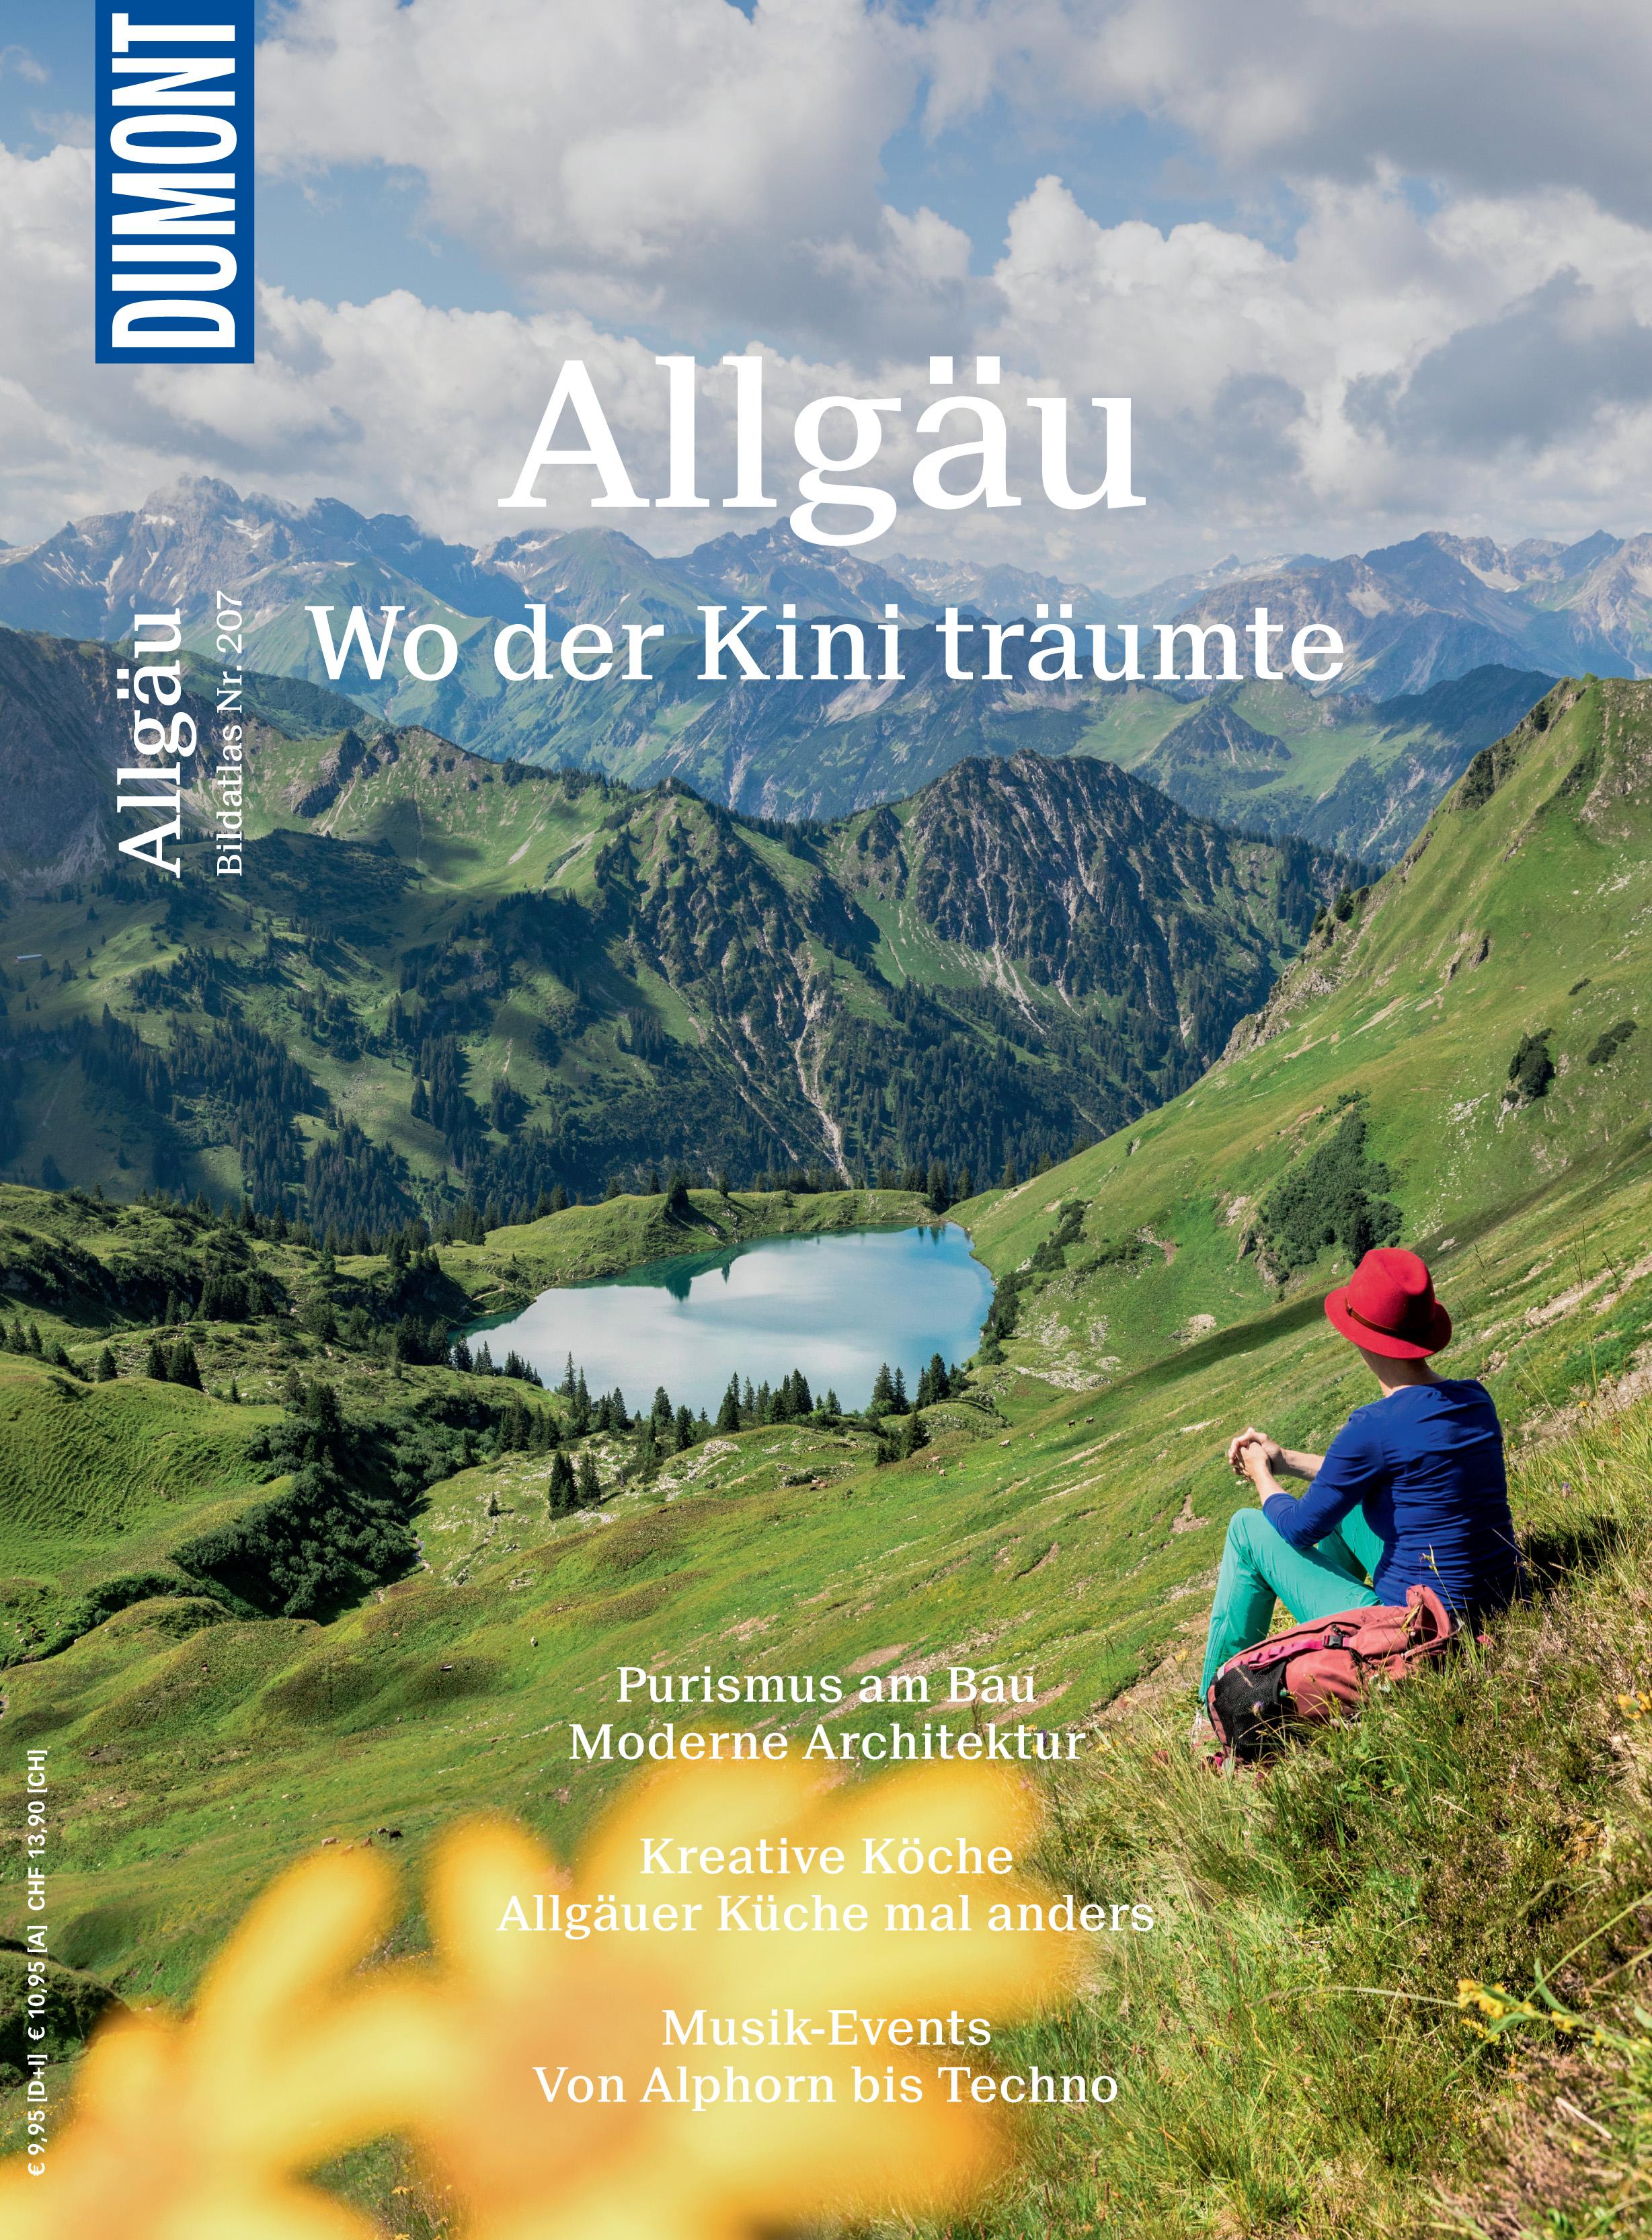 DuMont Bildatlas - Allgäu (Cover)